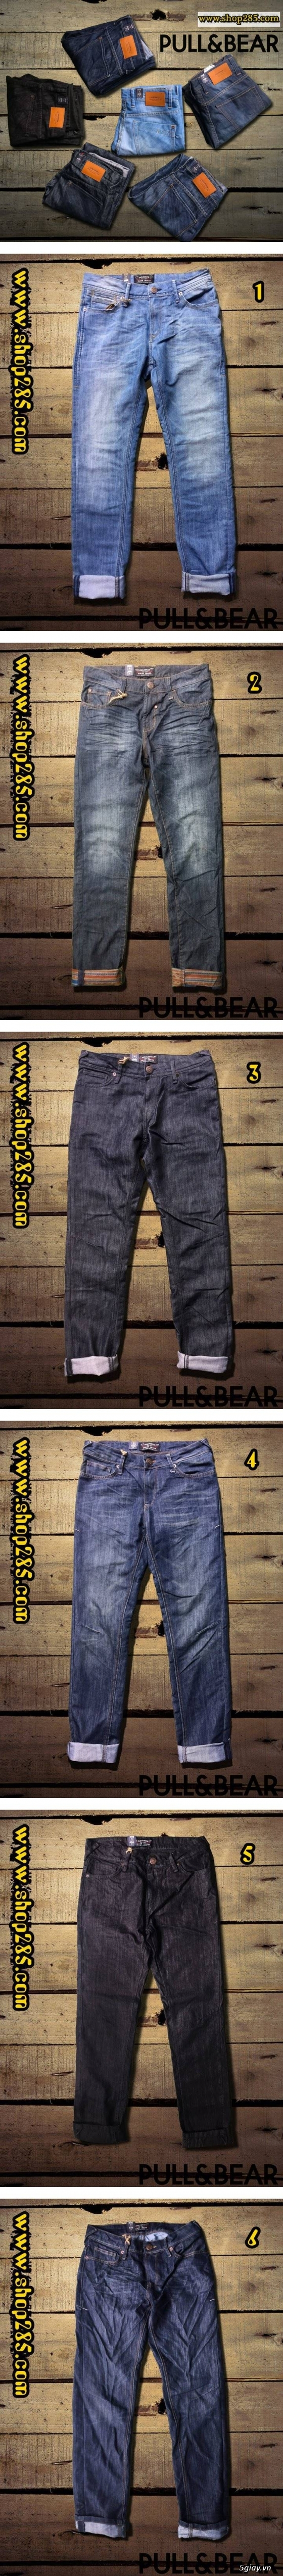 Shop285.com - Shop quần áo : Zara,Jules,Jake*s,,Hollister,Aber,CK,Tommy,Levis - 26